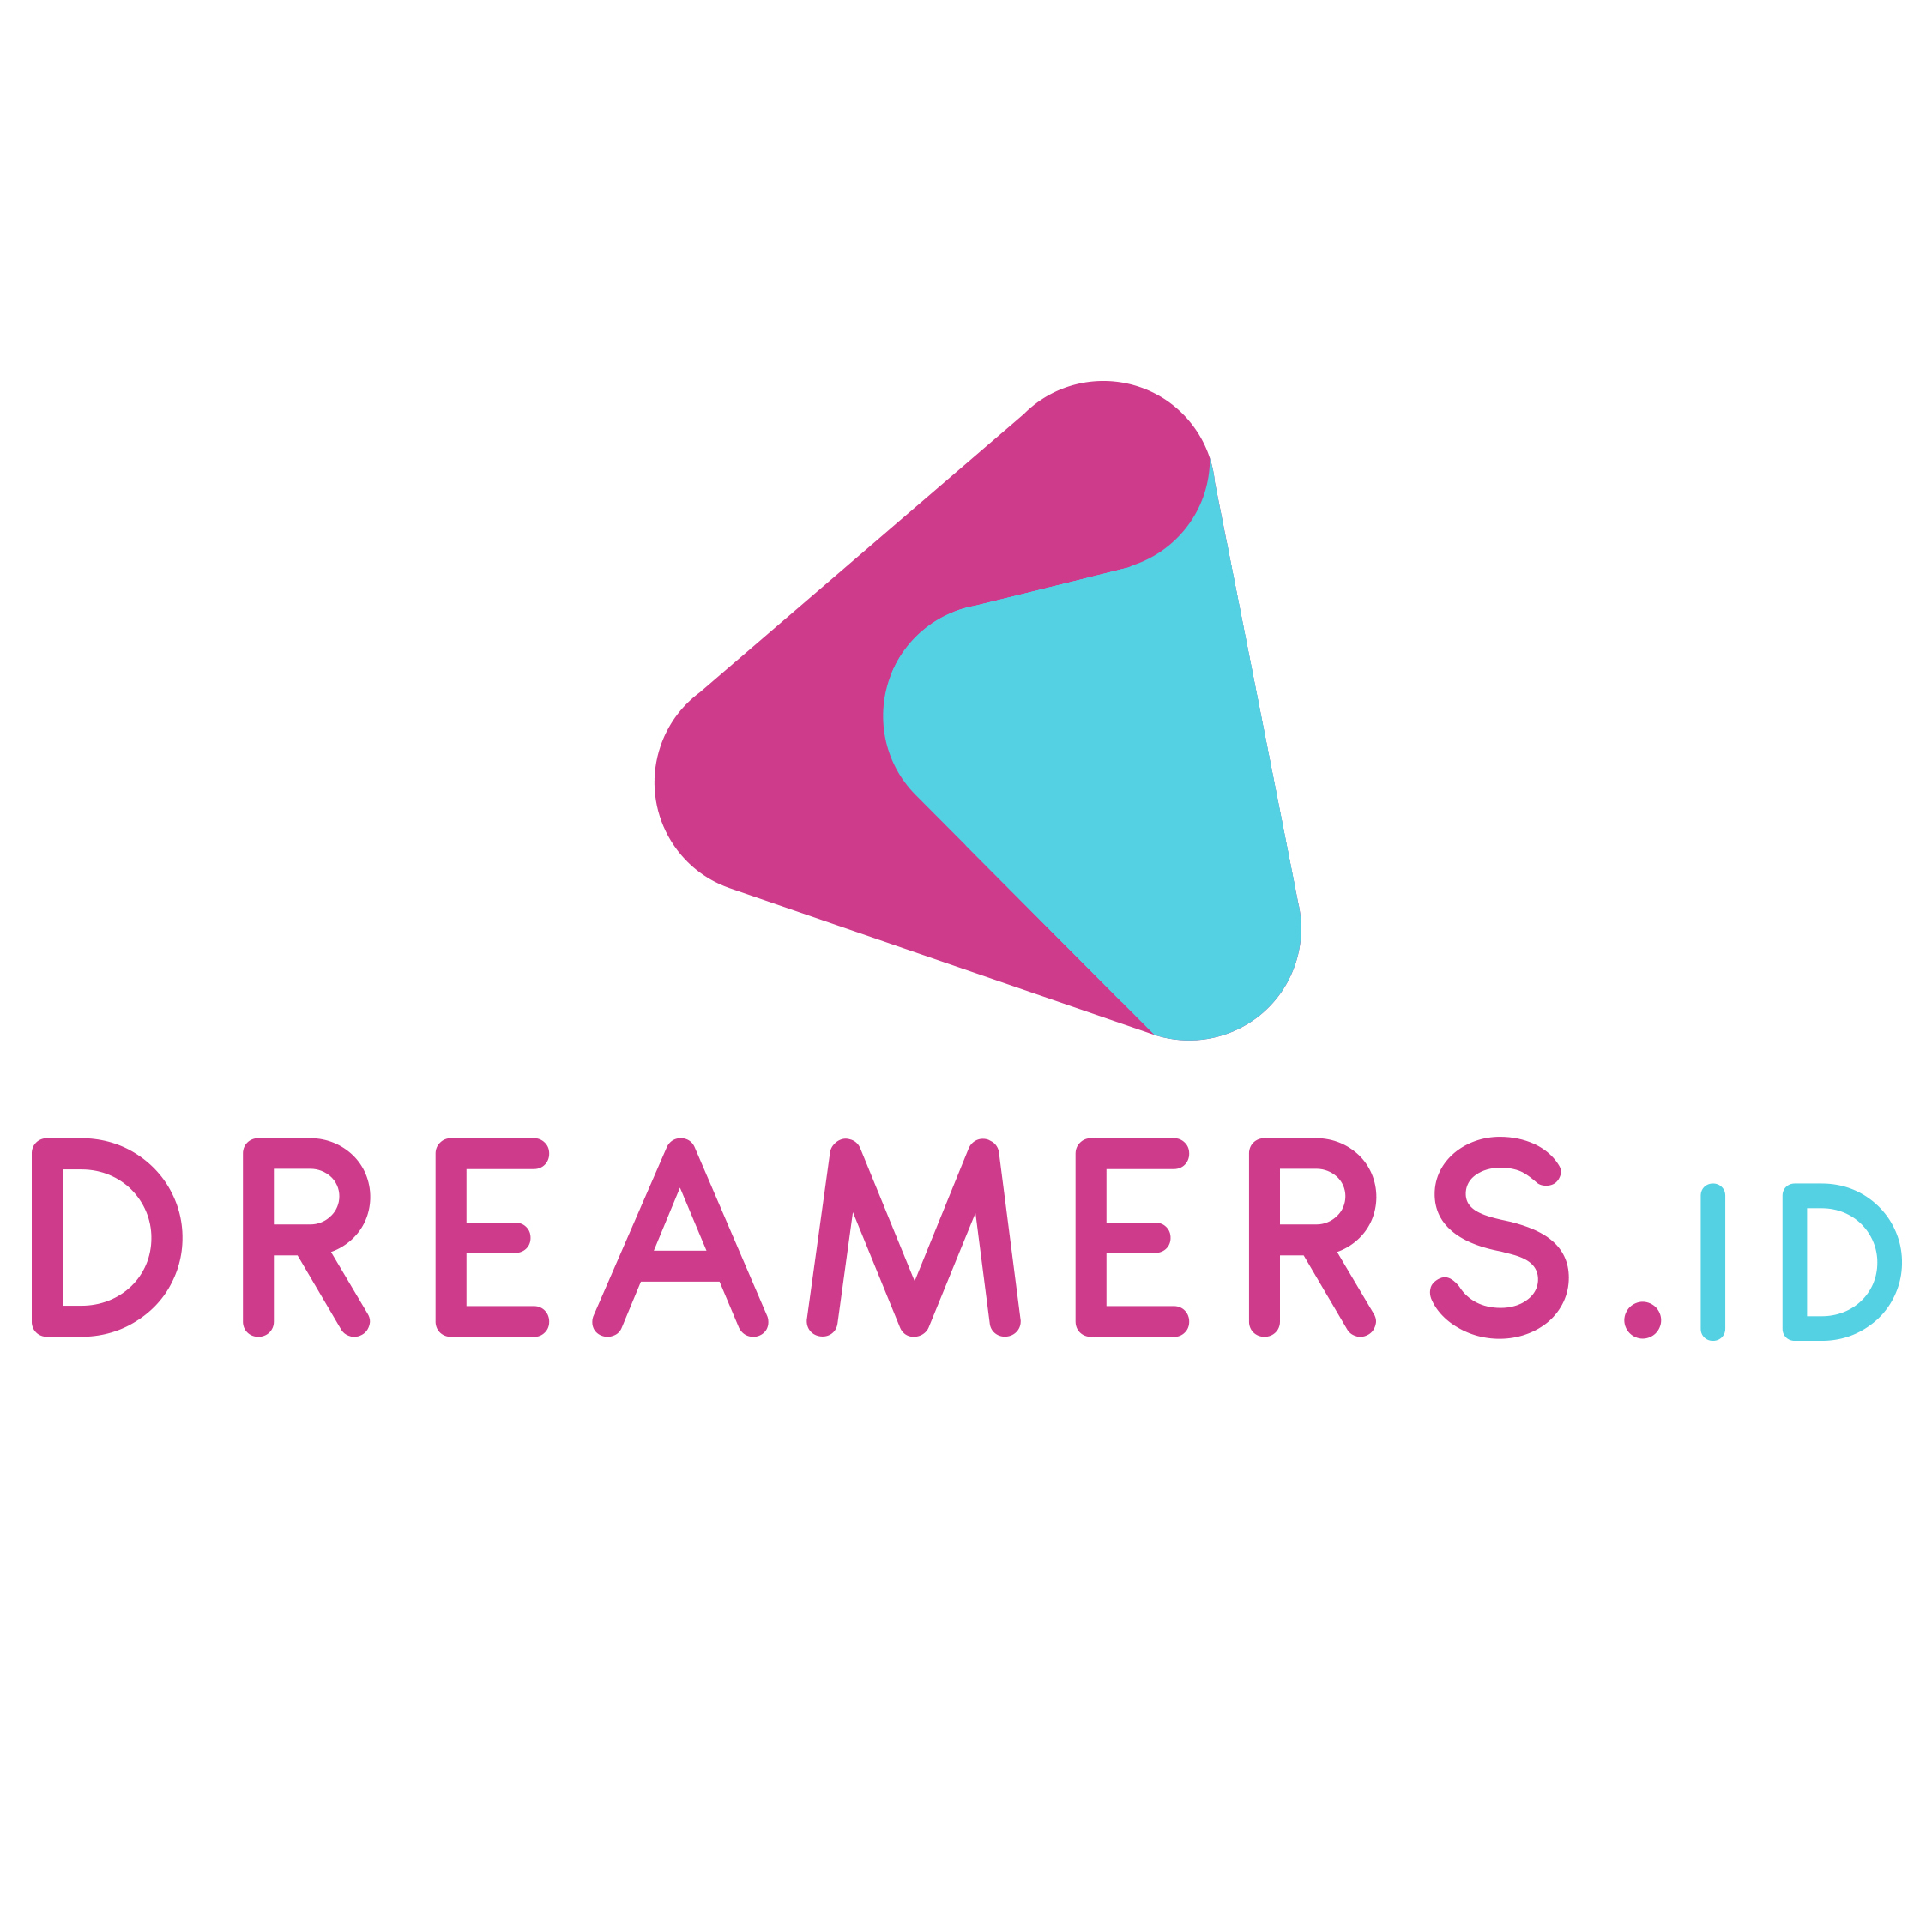 dreamersid